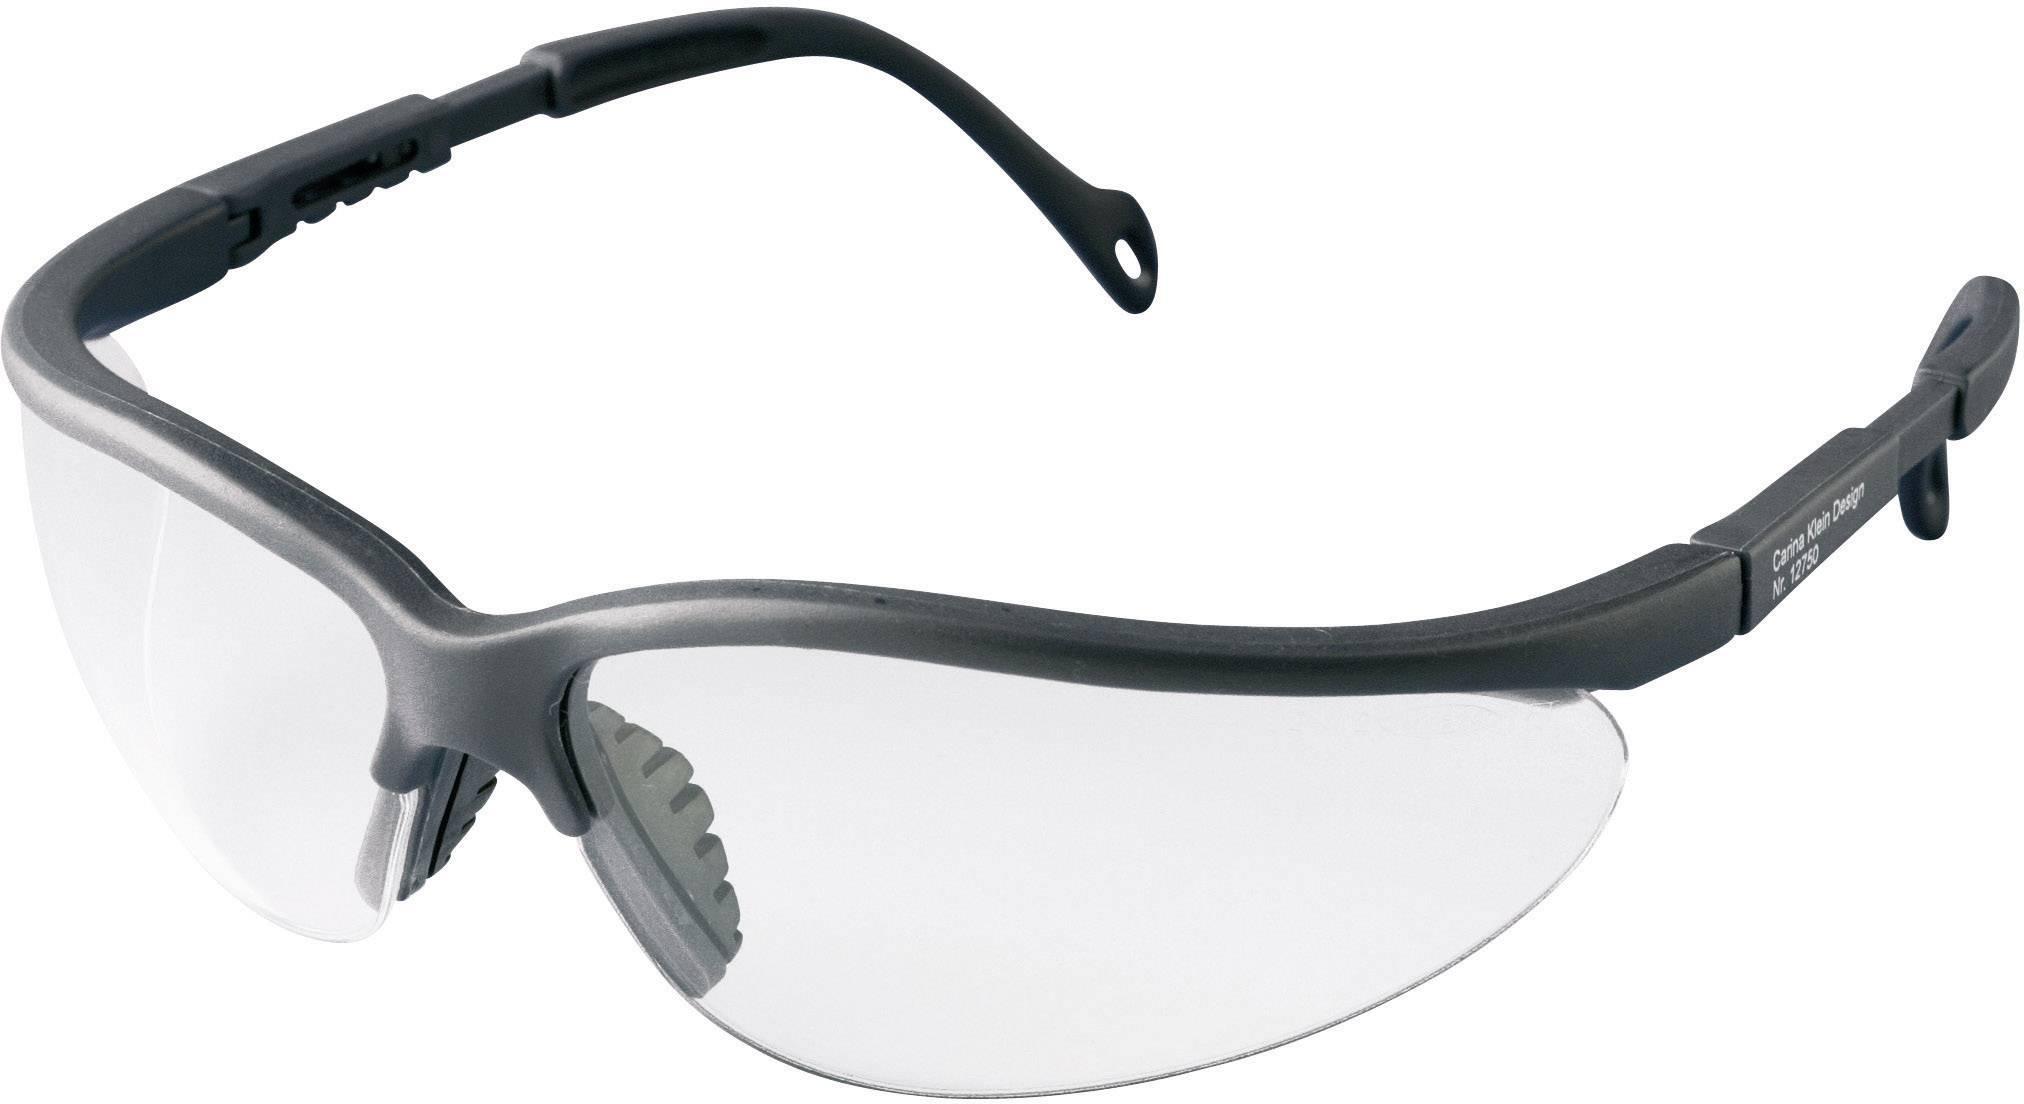 Ochranné okuliare Ekastu Sekur Safety Carina Klein Design 12750